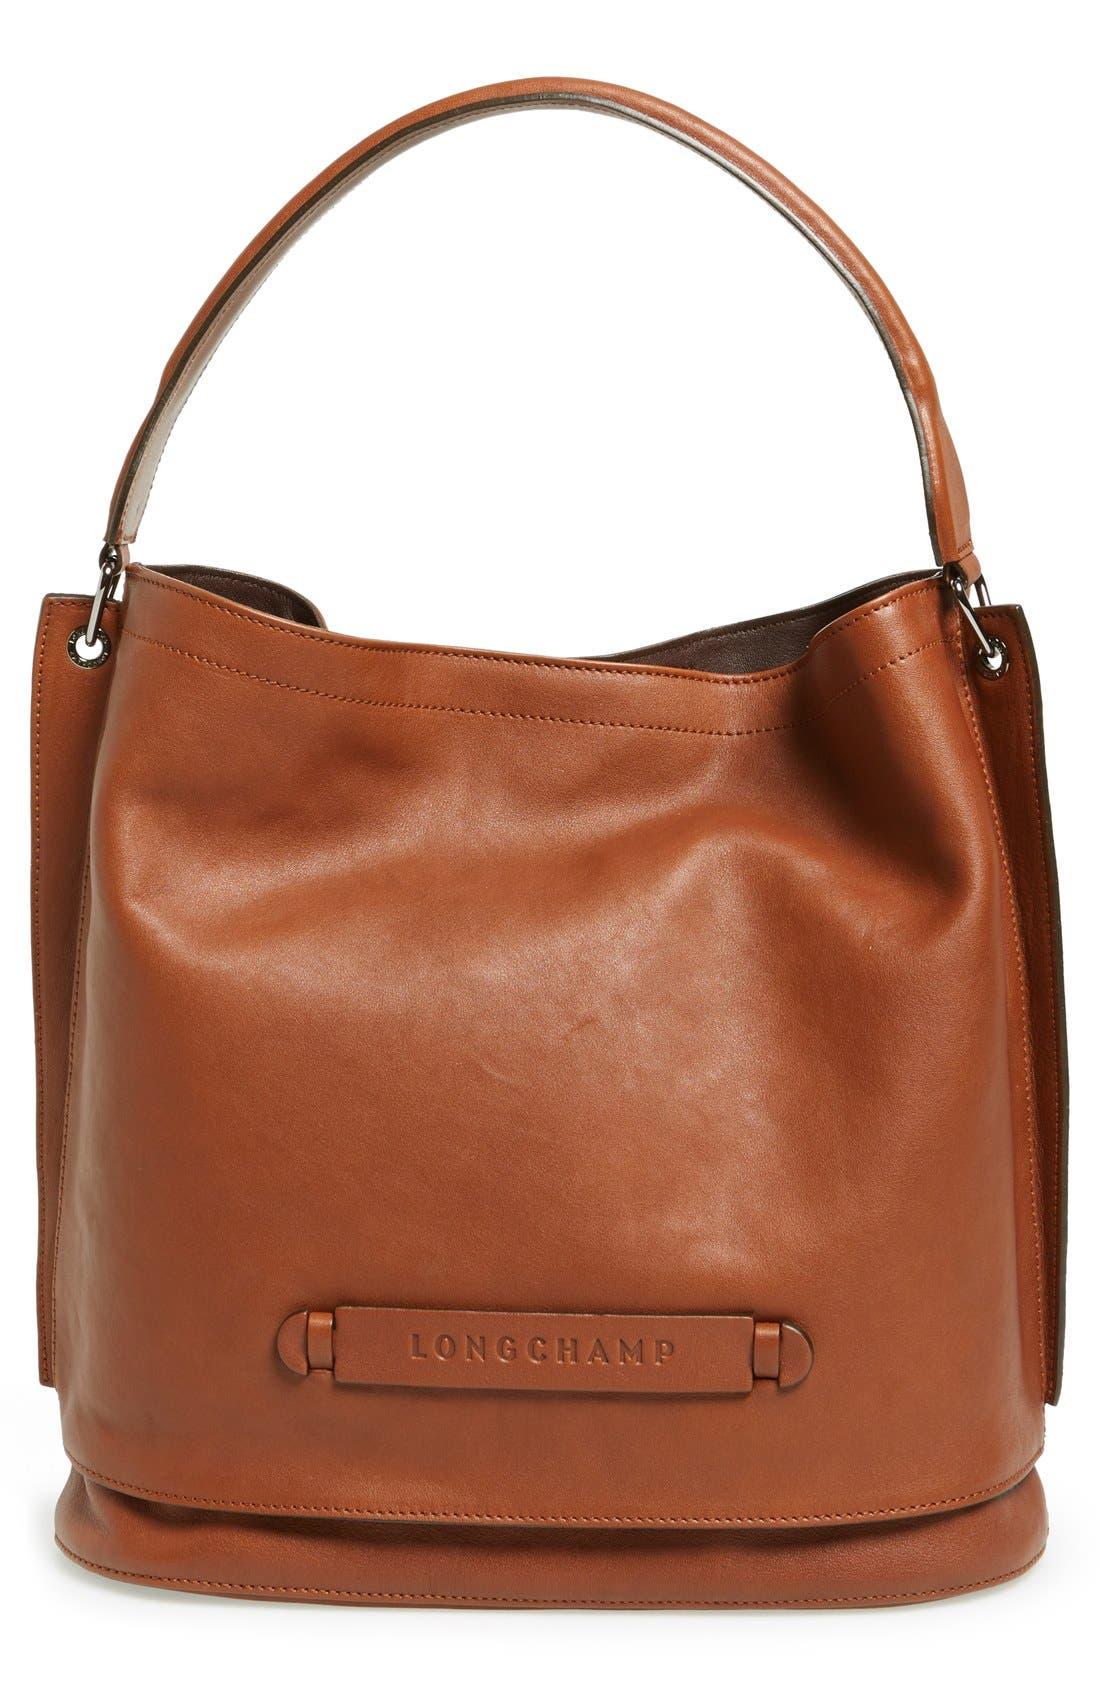 Alternate Image 1 Selected - Longchamp '3D' Leather Hobo